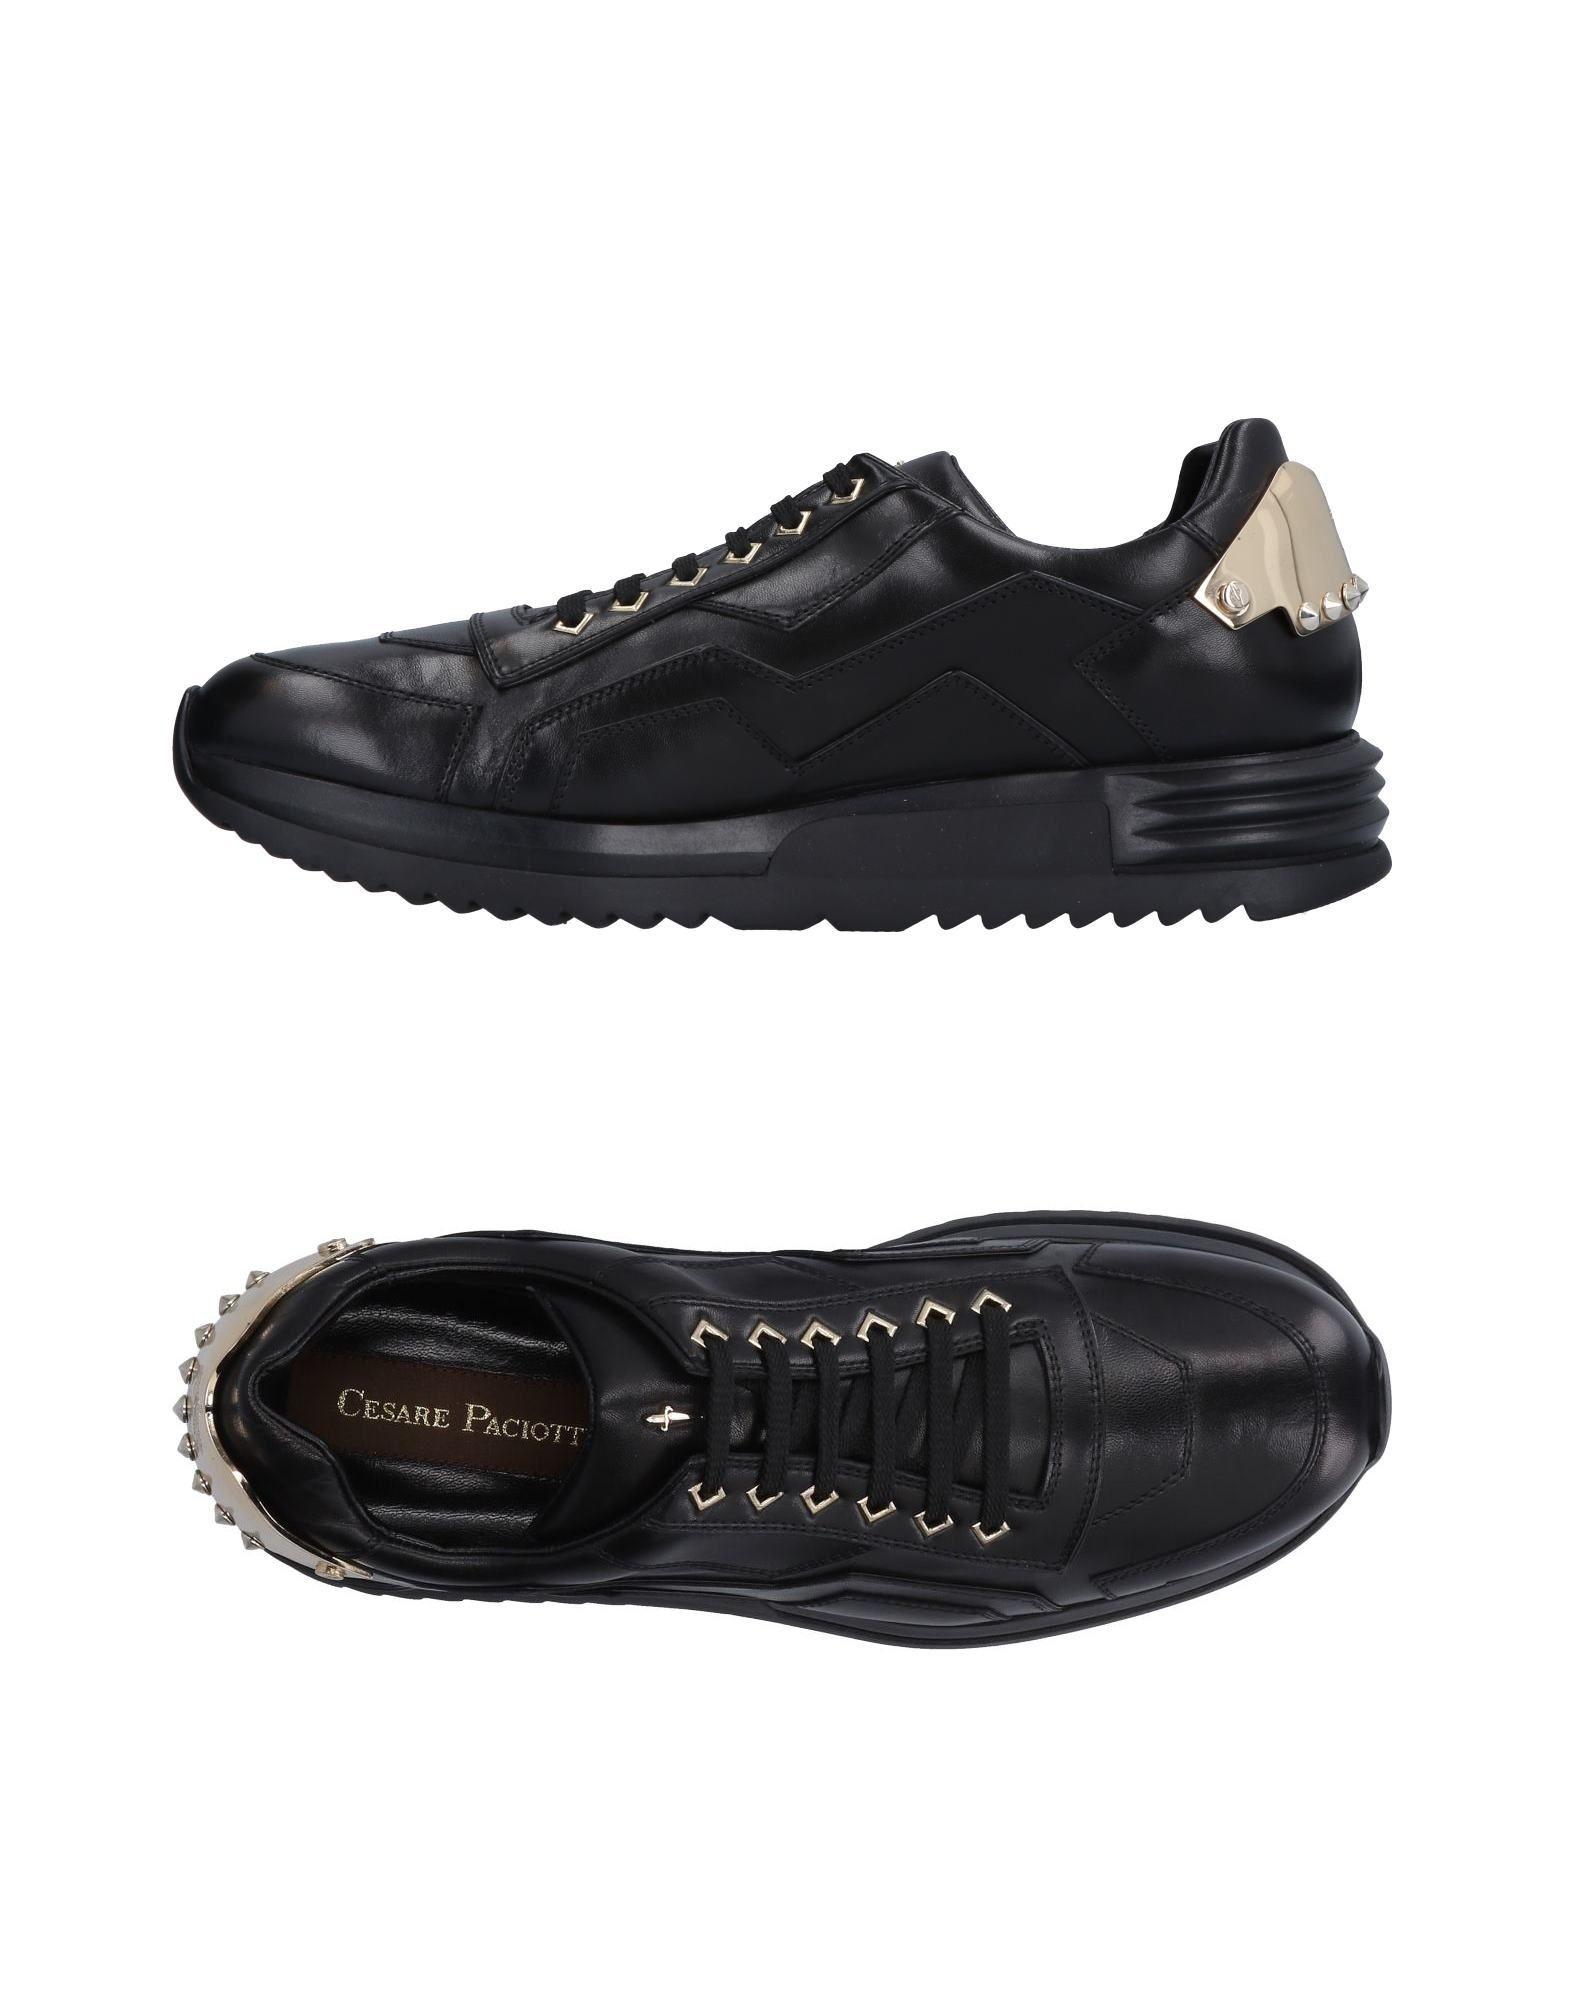 Cesare Paciotti Sneakers Herren  11509093DK Gute Qualität beliebte Schuhe